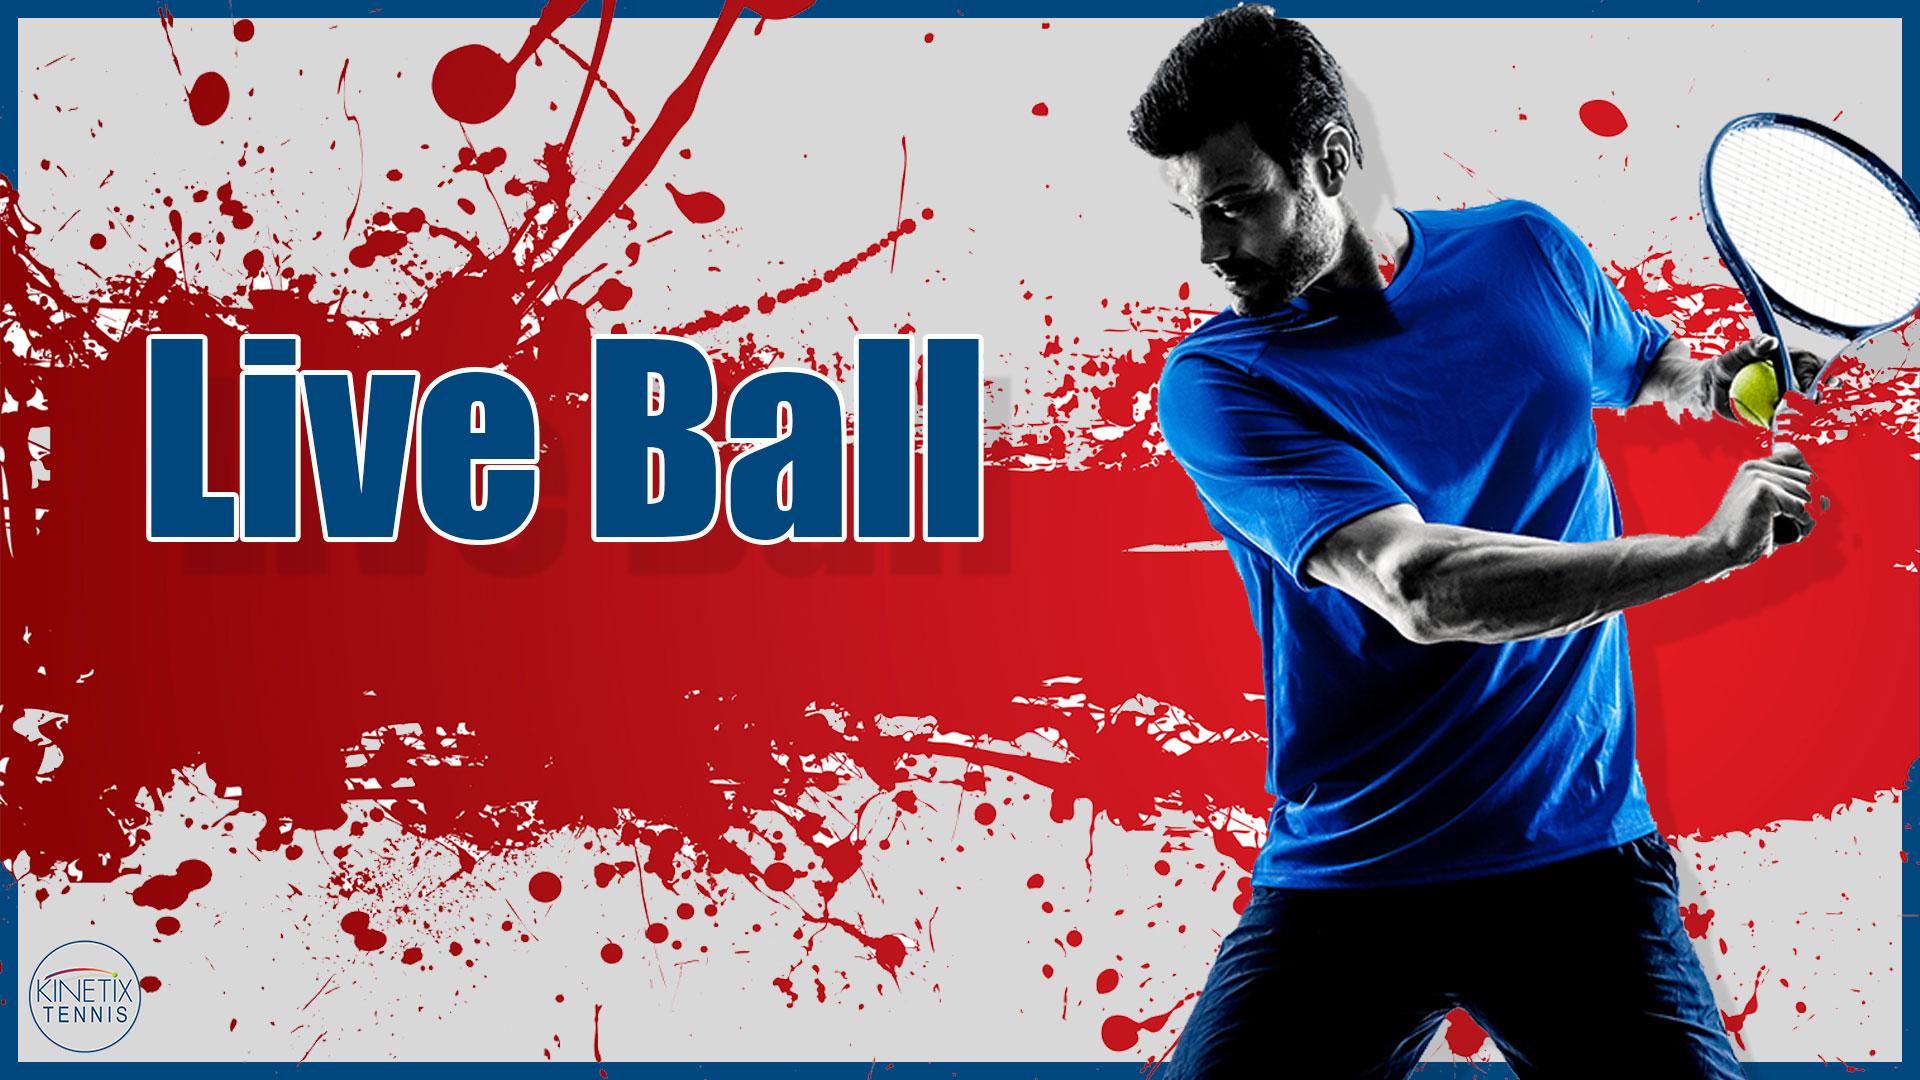 Adult Live ball